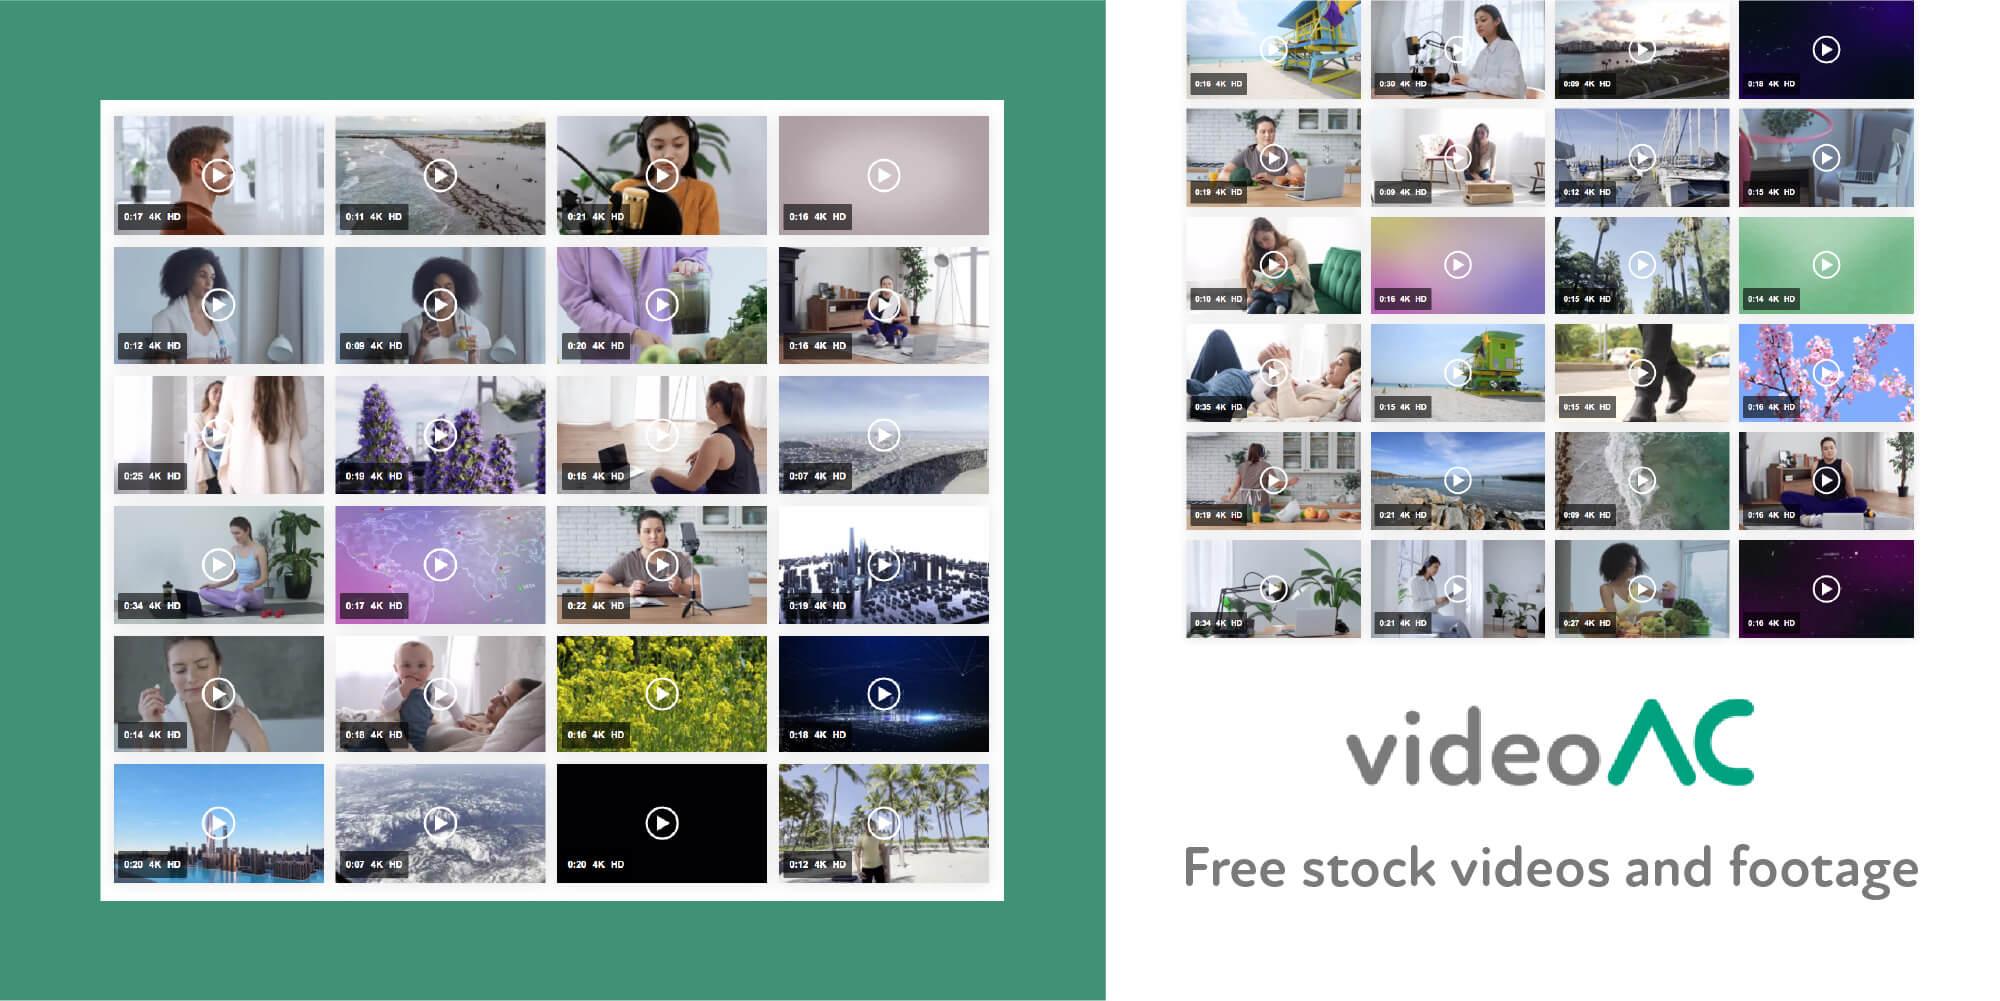 video-ac free stock video